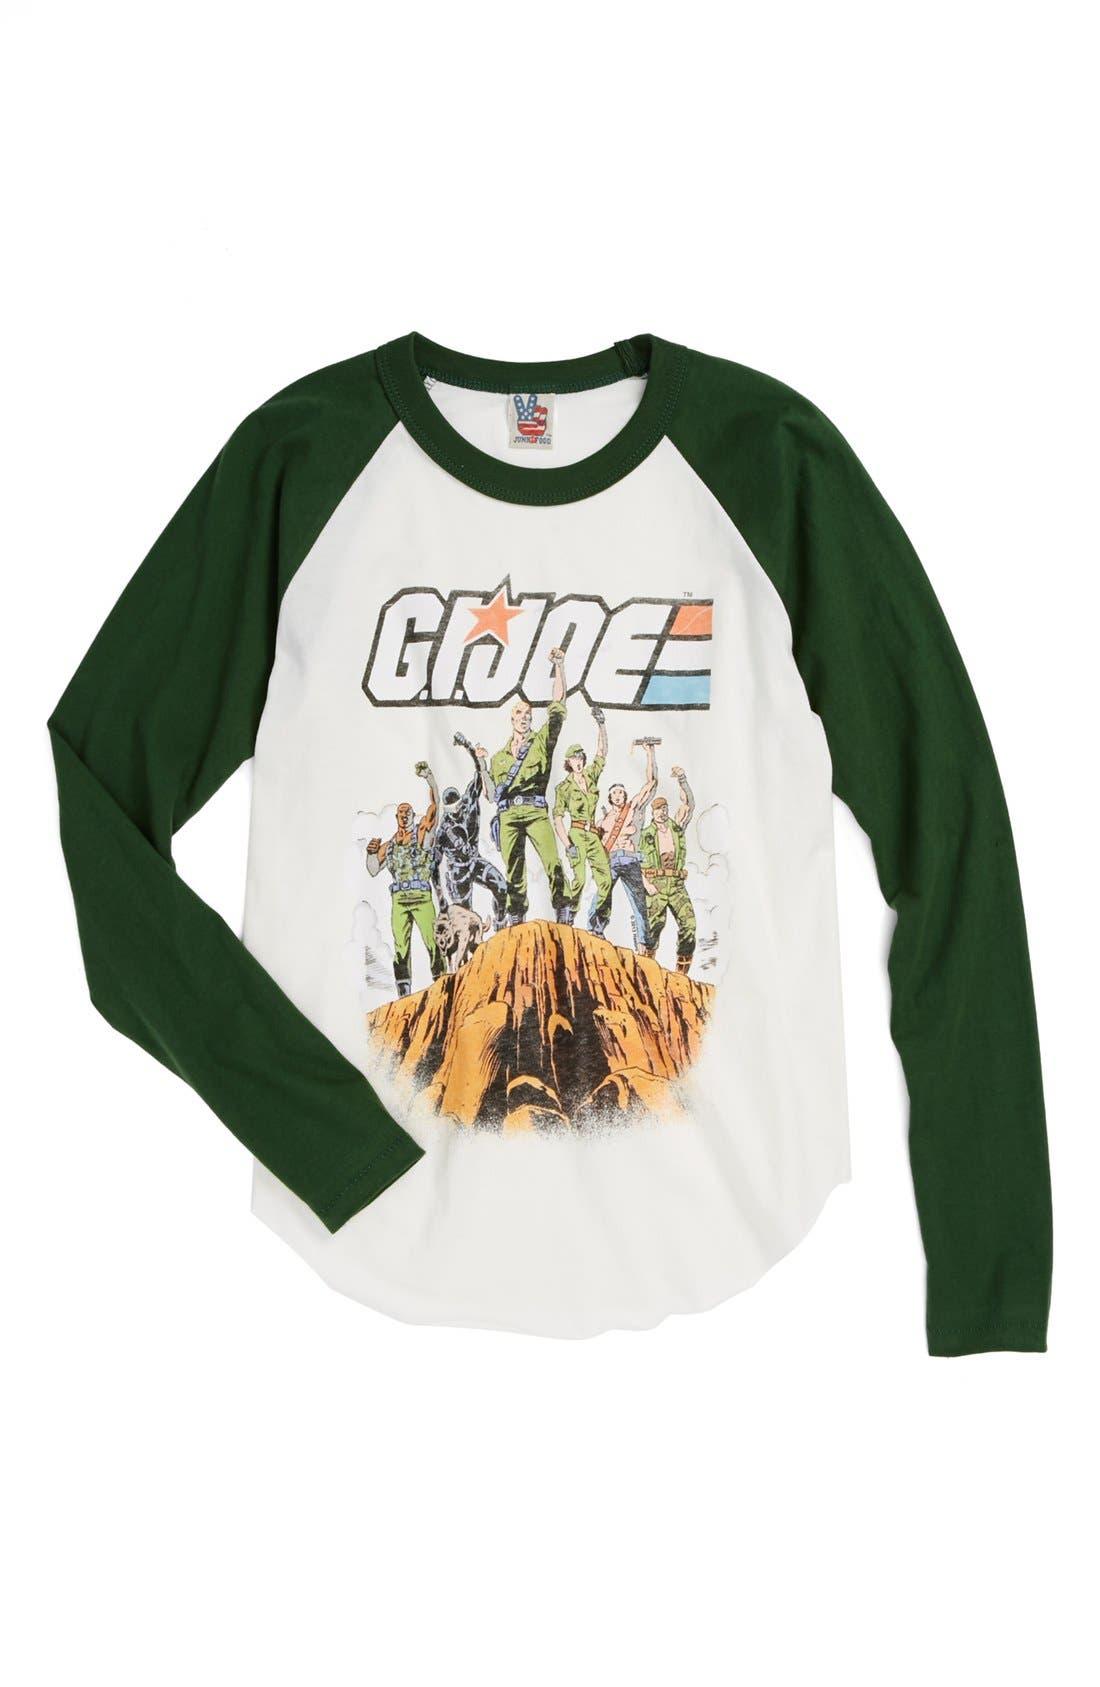 Alternate Image 1 Selected - Junk Food 'G.I. Joe' Baseball T-Shirt (Toddler Boys, Little Boys & Big Boys)